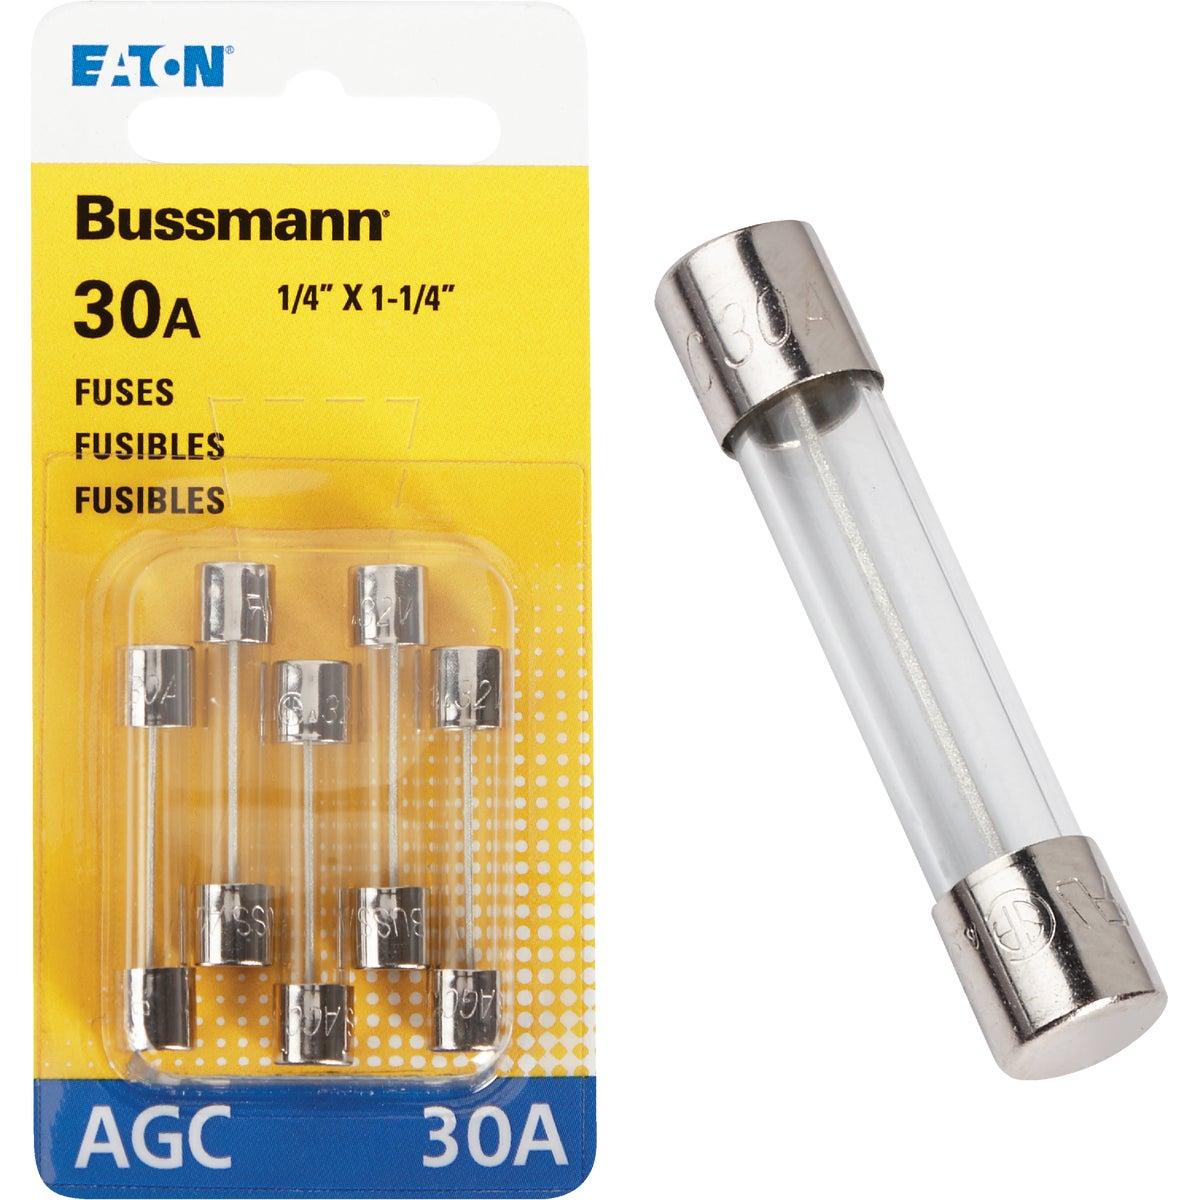 30AMP FUSE - BP/AGC-30-RP by Bussmann Cooper